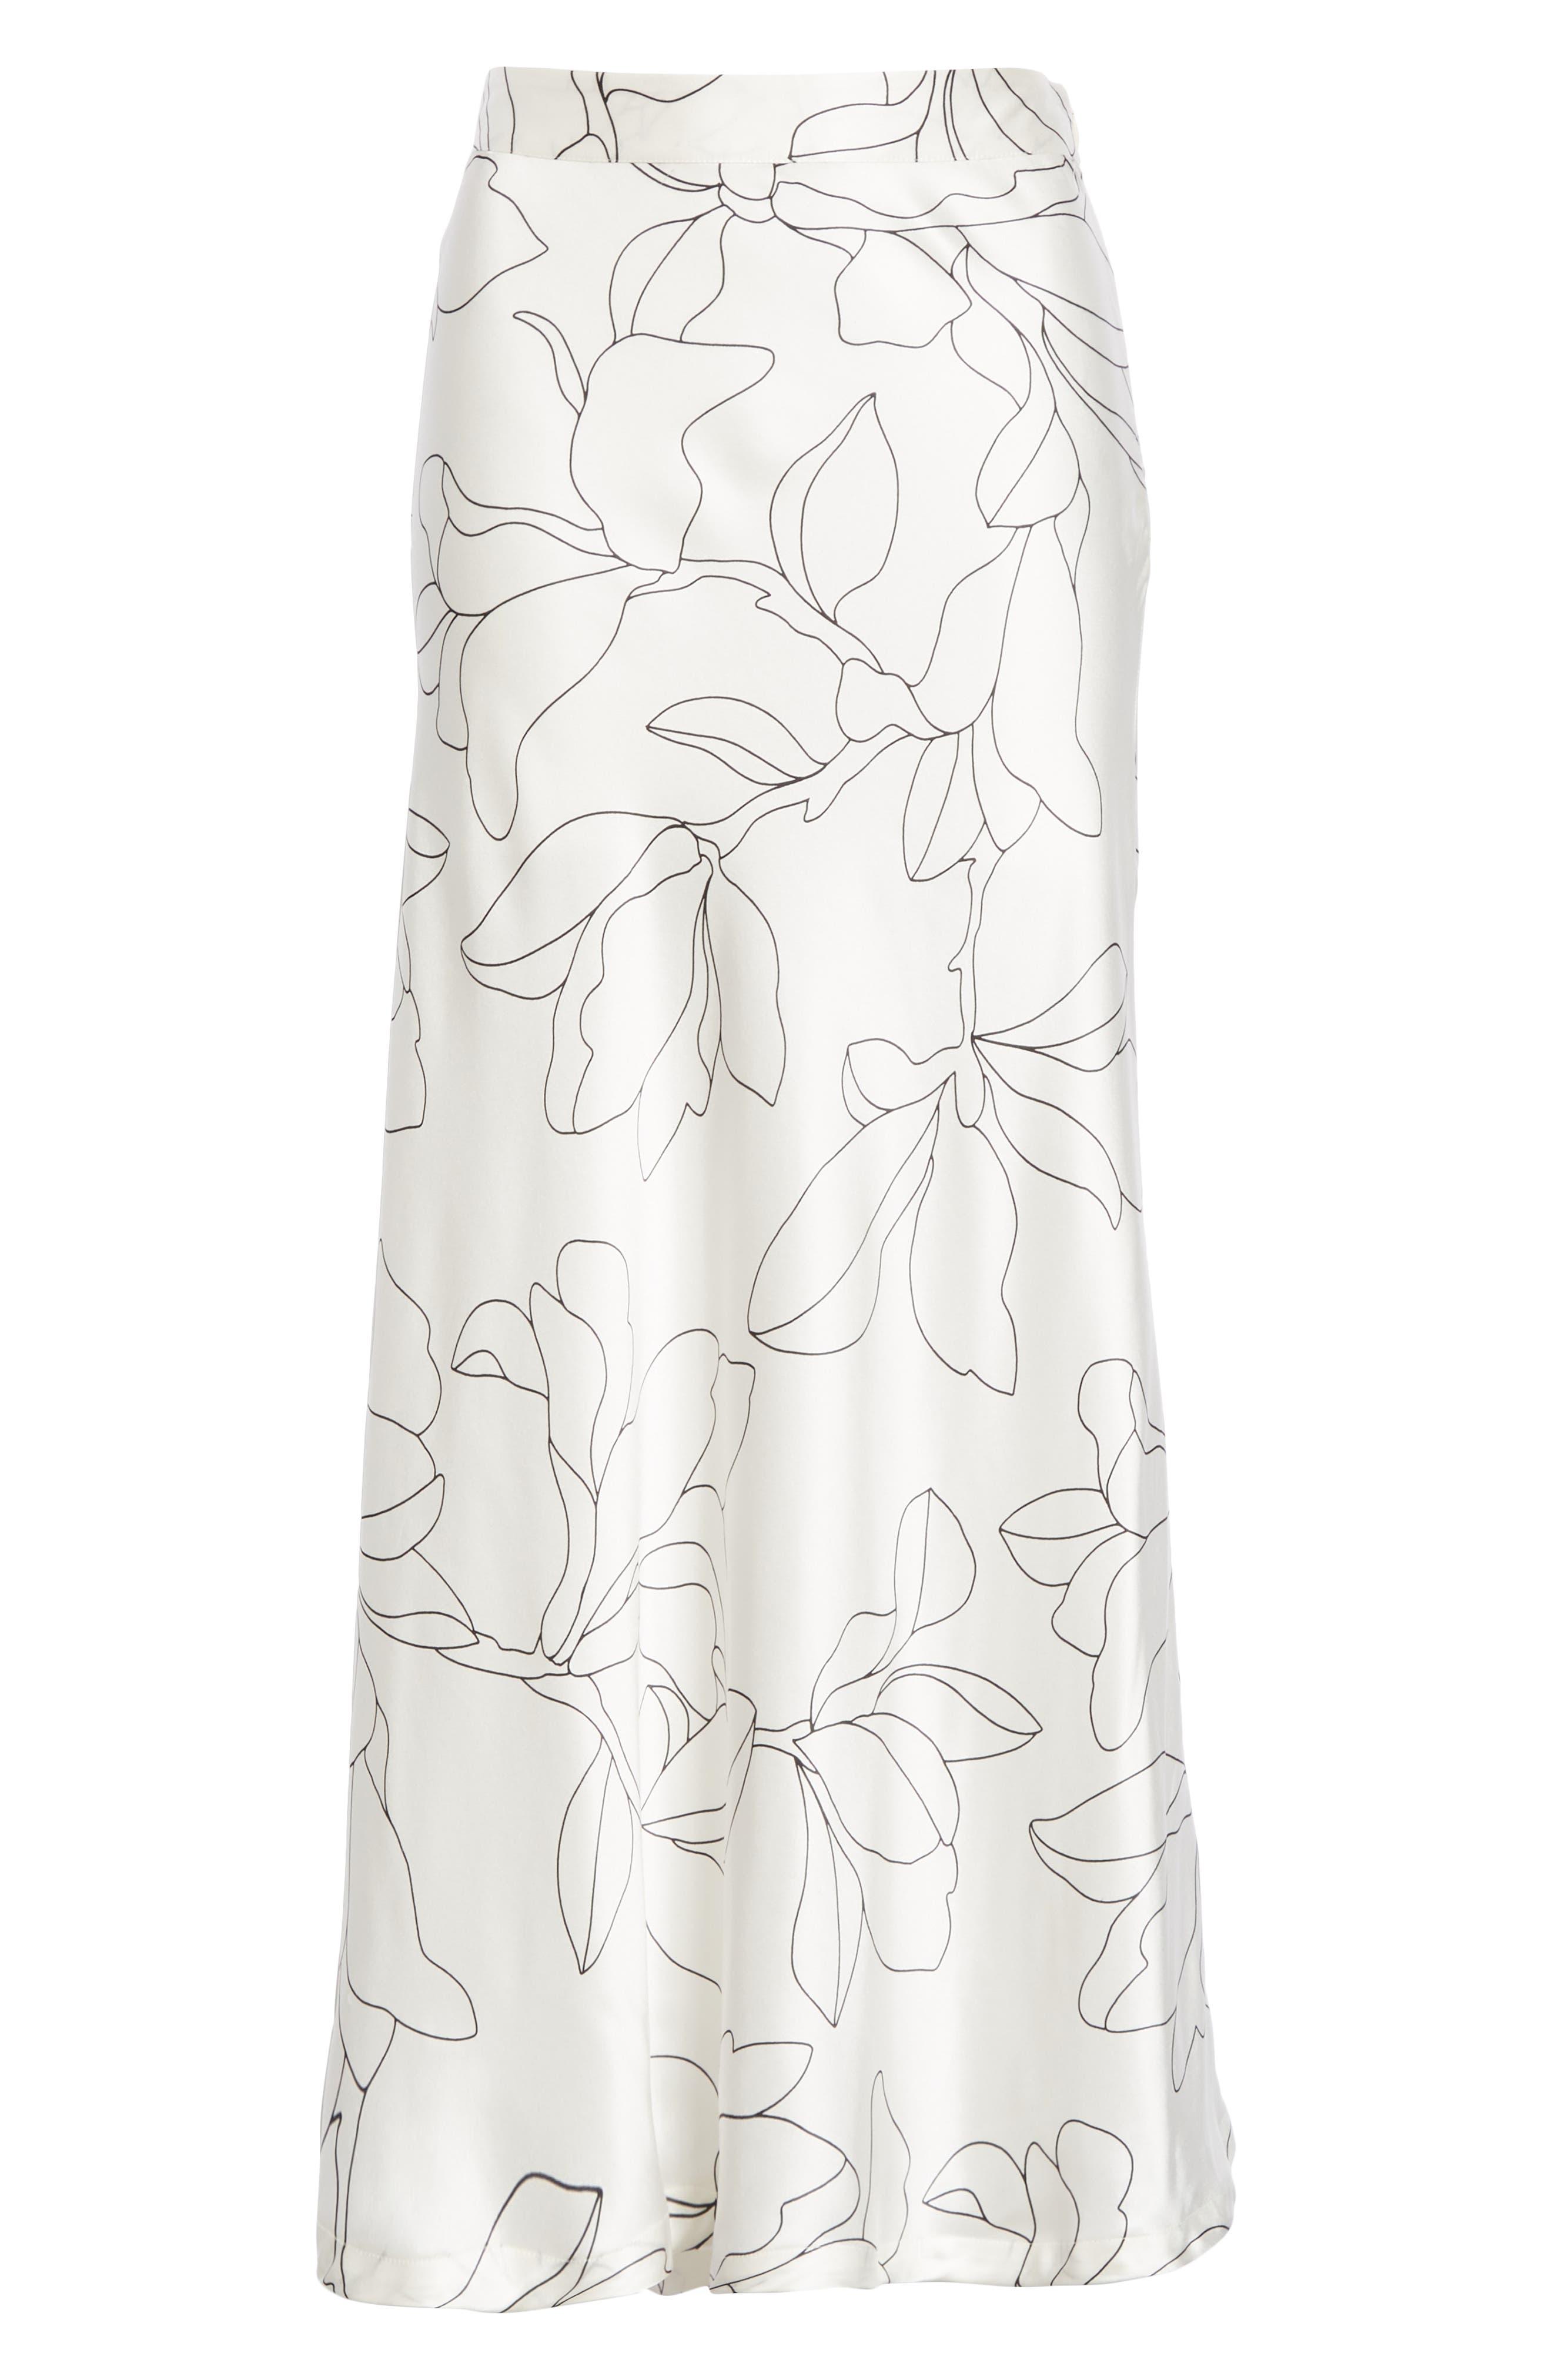 Iva Floral Silk Midi Skirt,                             Alternate thumbnail 6, color,                             NATURAL WHITE TRUE BLACK